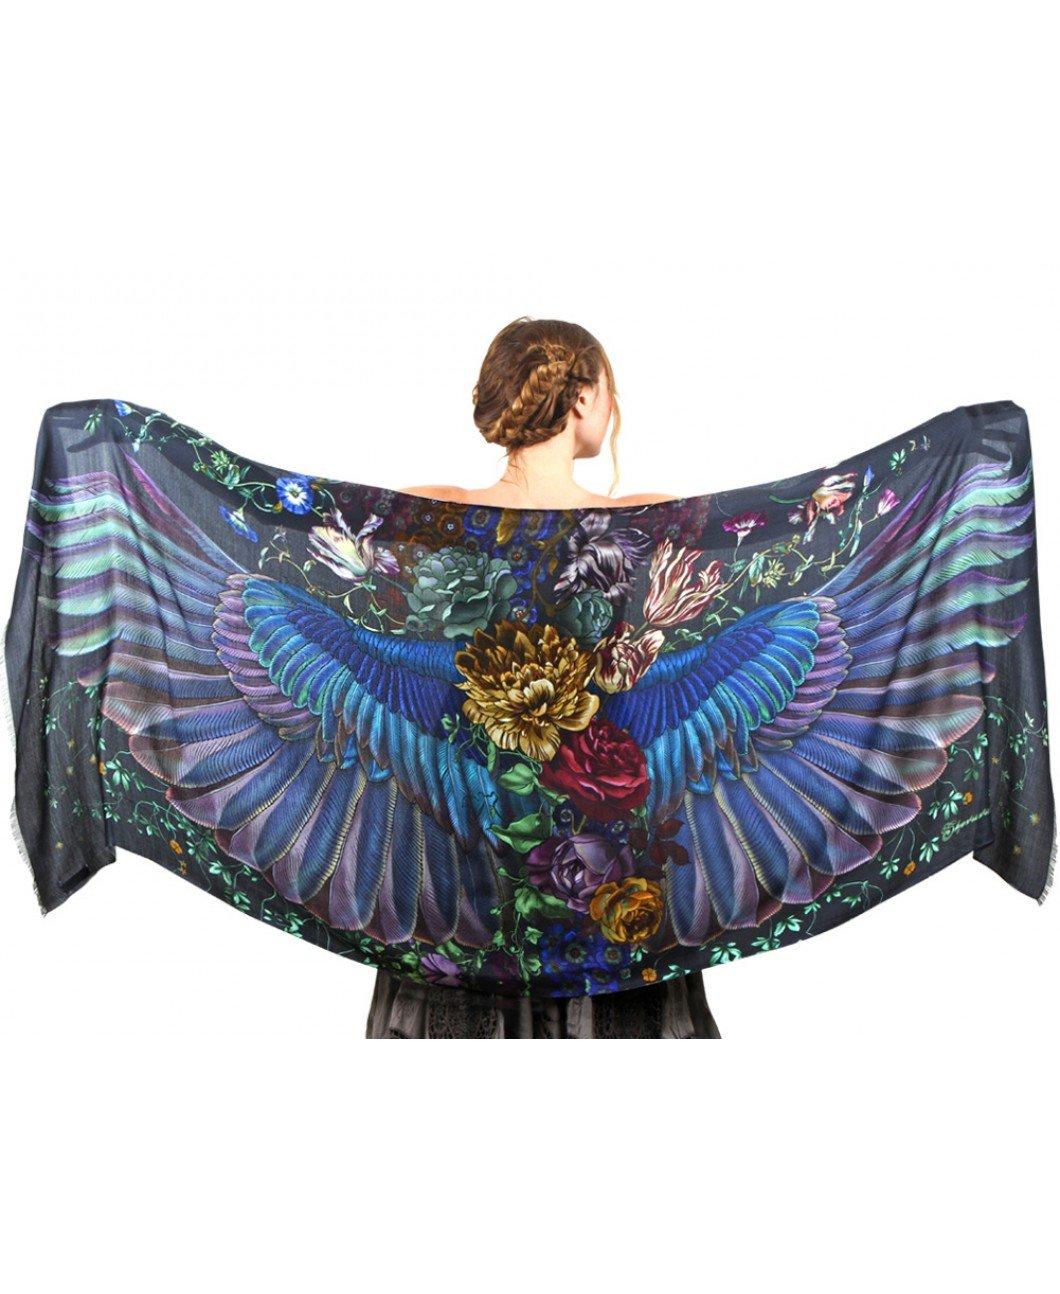 Pure Silk Hand Painted Onyx Dark Bird Wings Designer Shawl Scarf Wrap